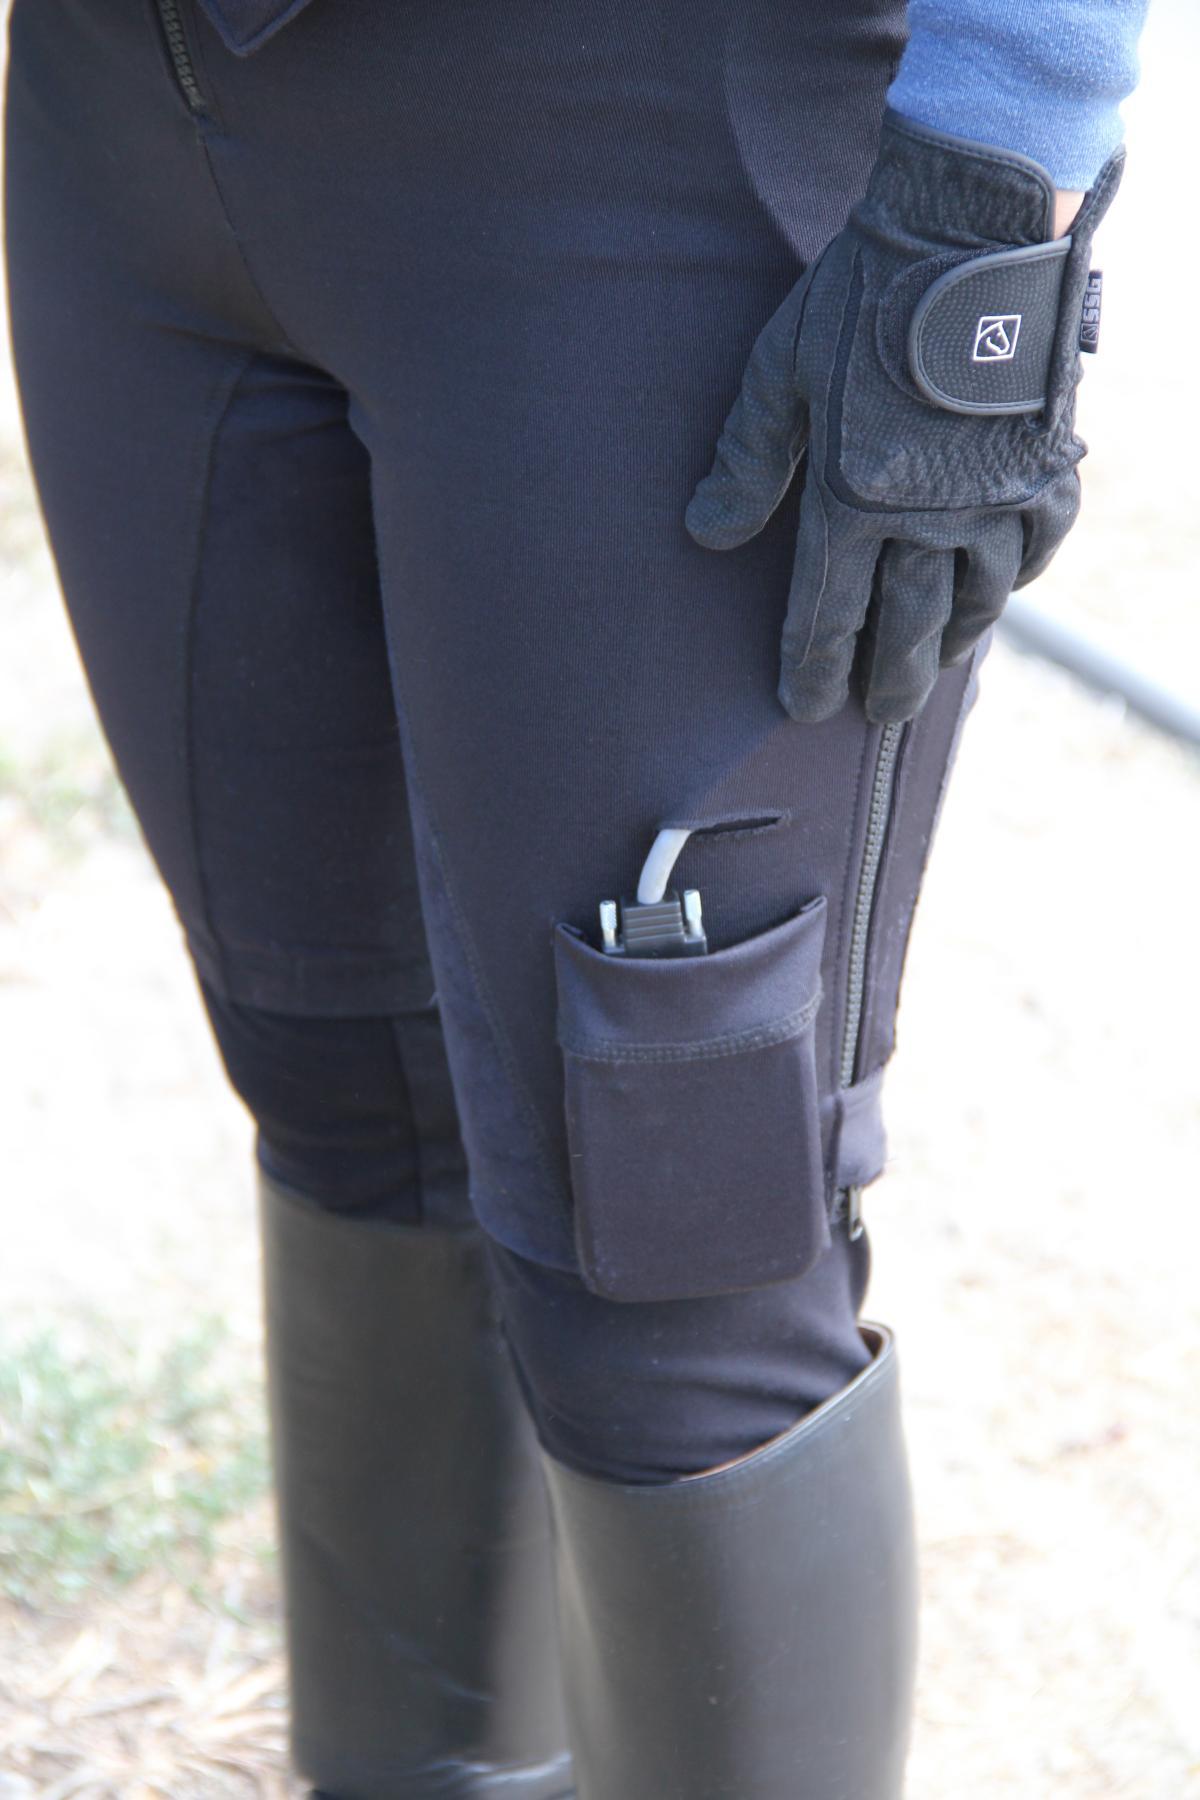 Equisens Equestrian Balance Sensor Controller in Pocket